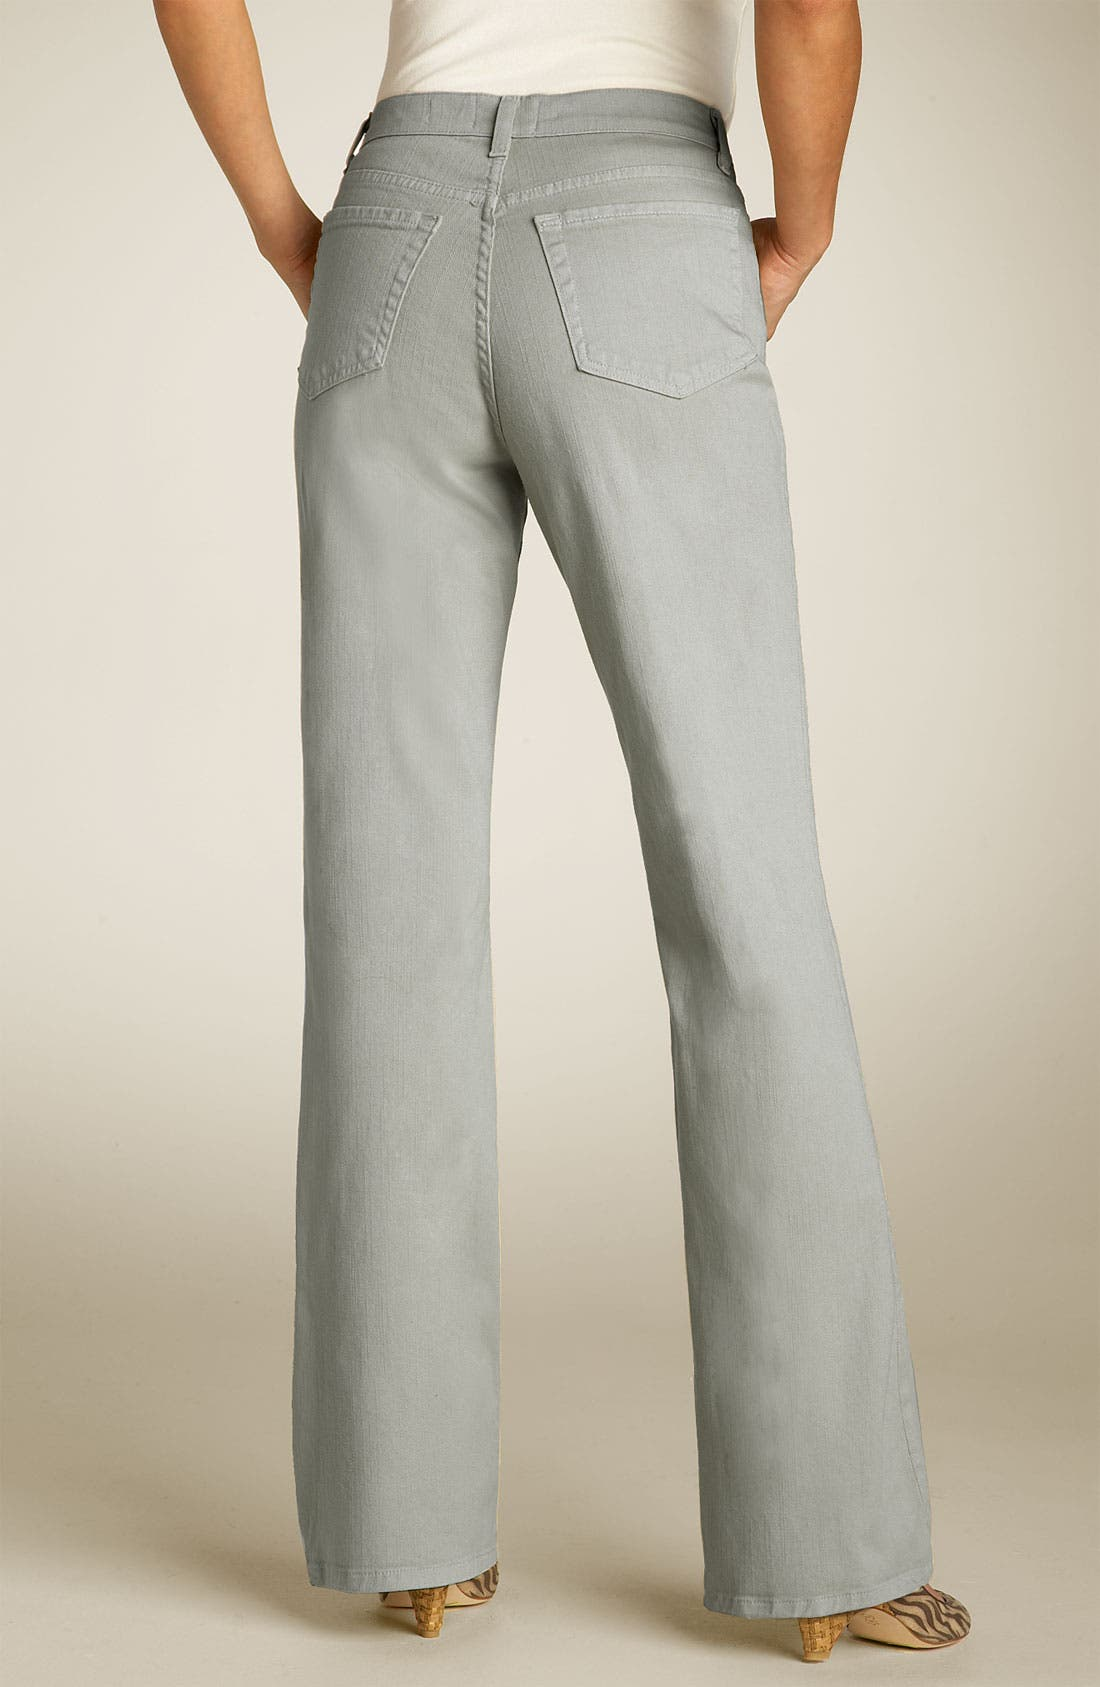 'Sarah' Stretch Bootcut Jeans,                             Alternate thumbnail 2, color,                             059